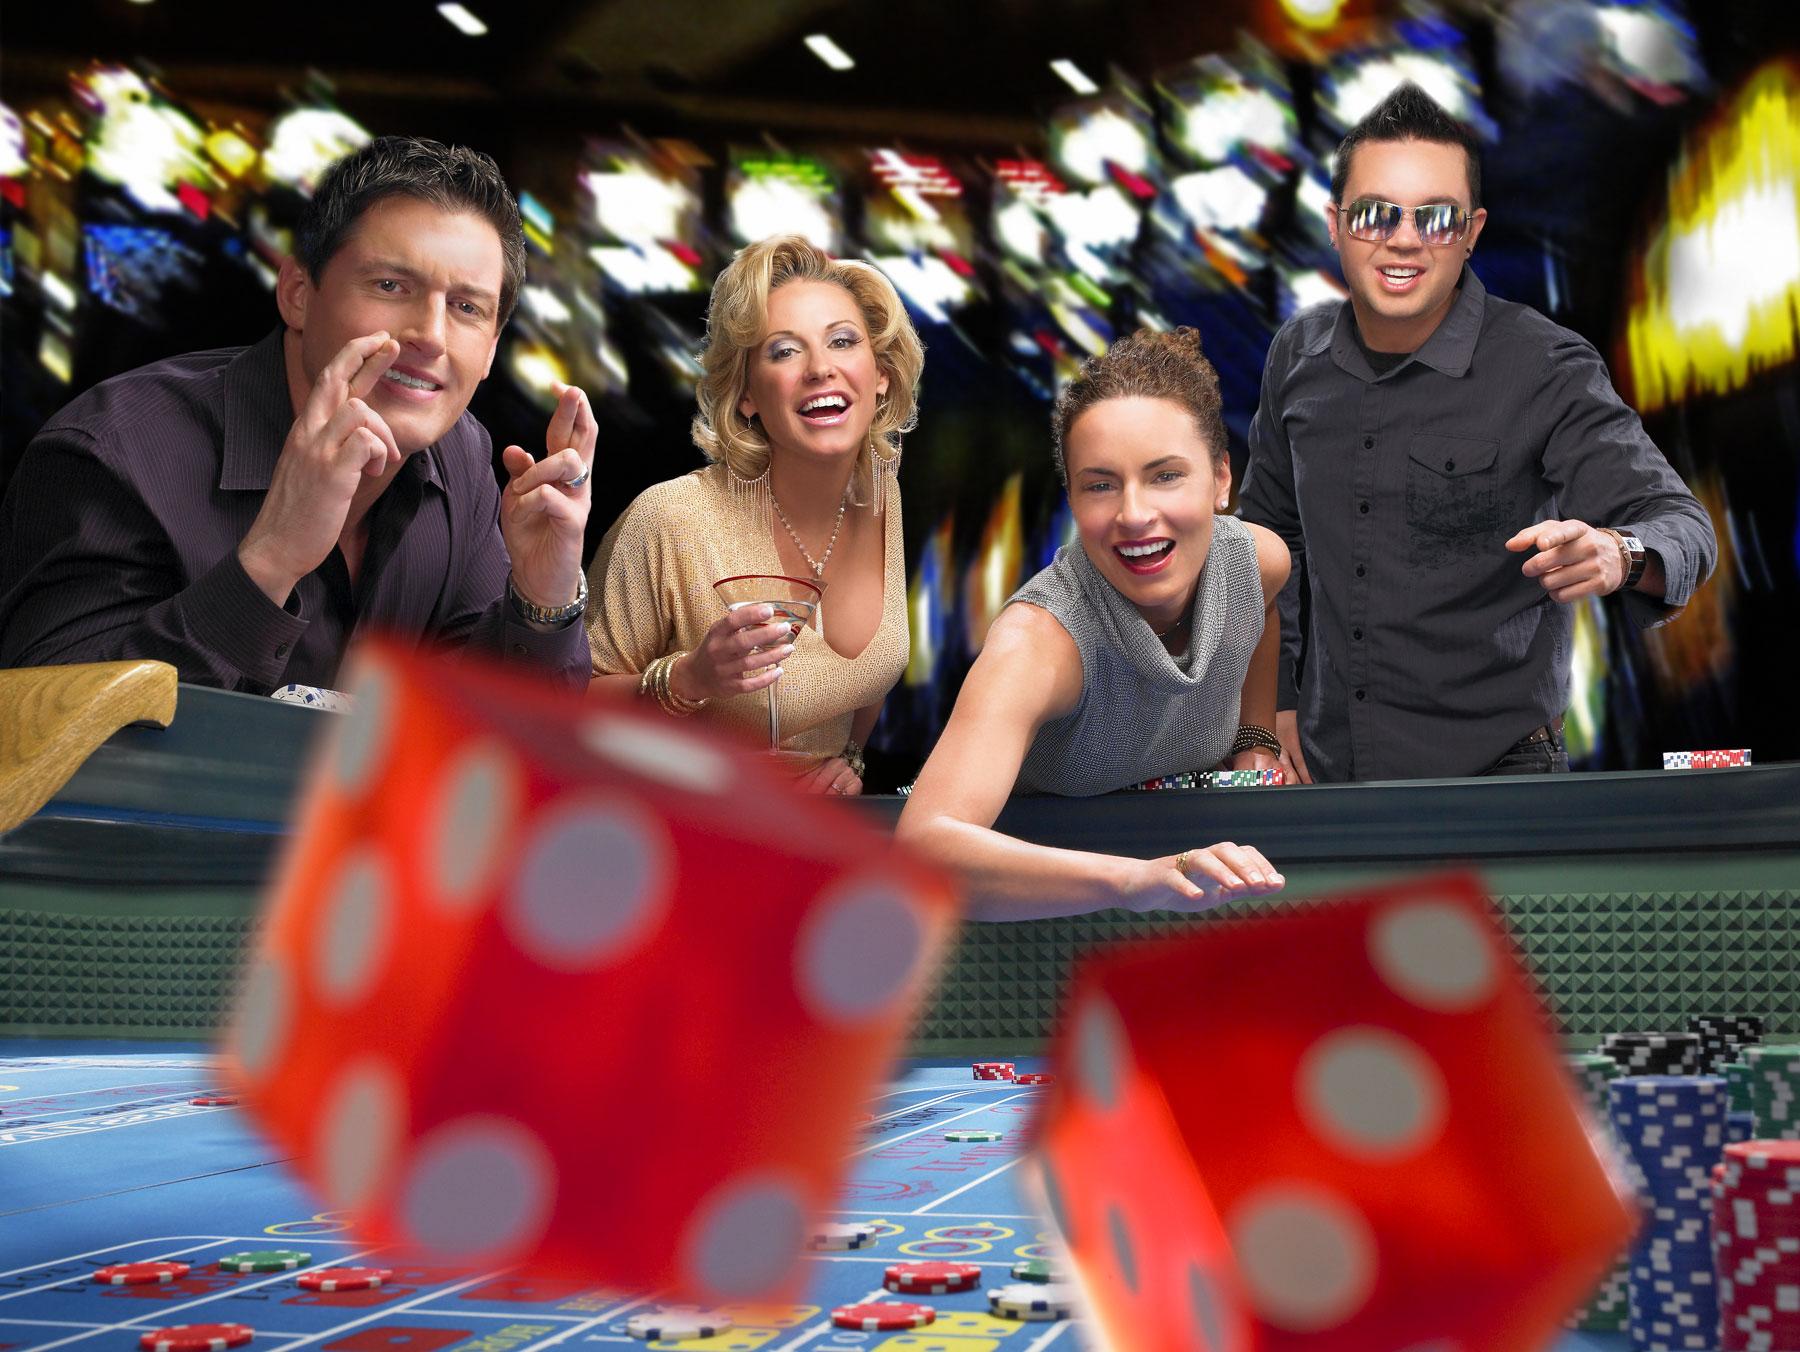 Top 10 casino usa